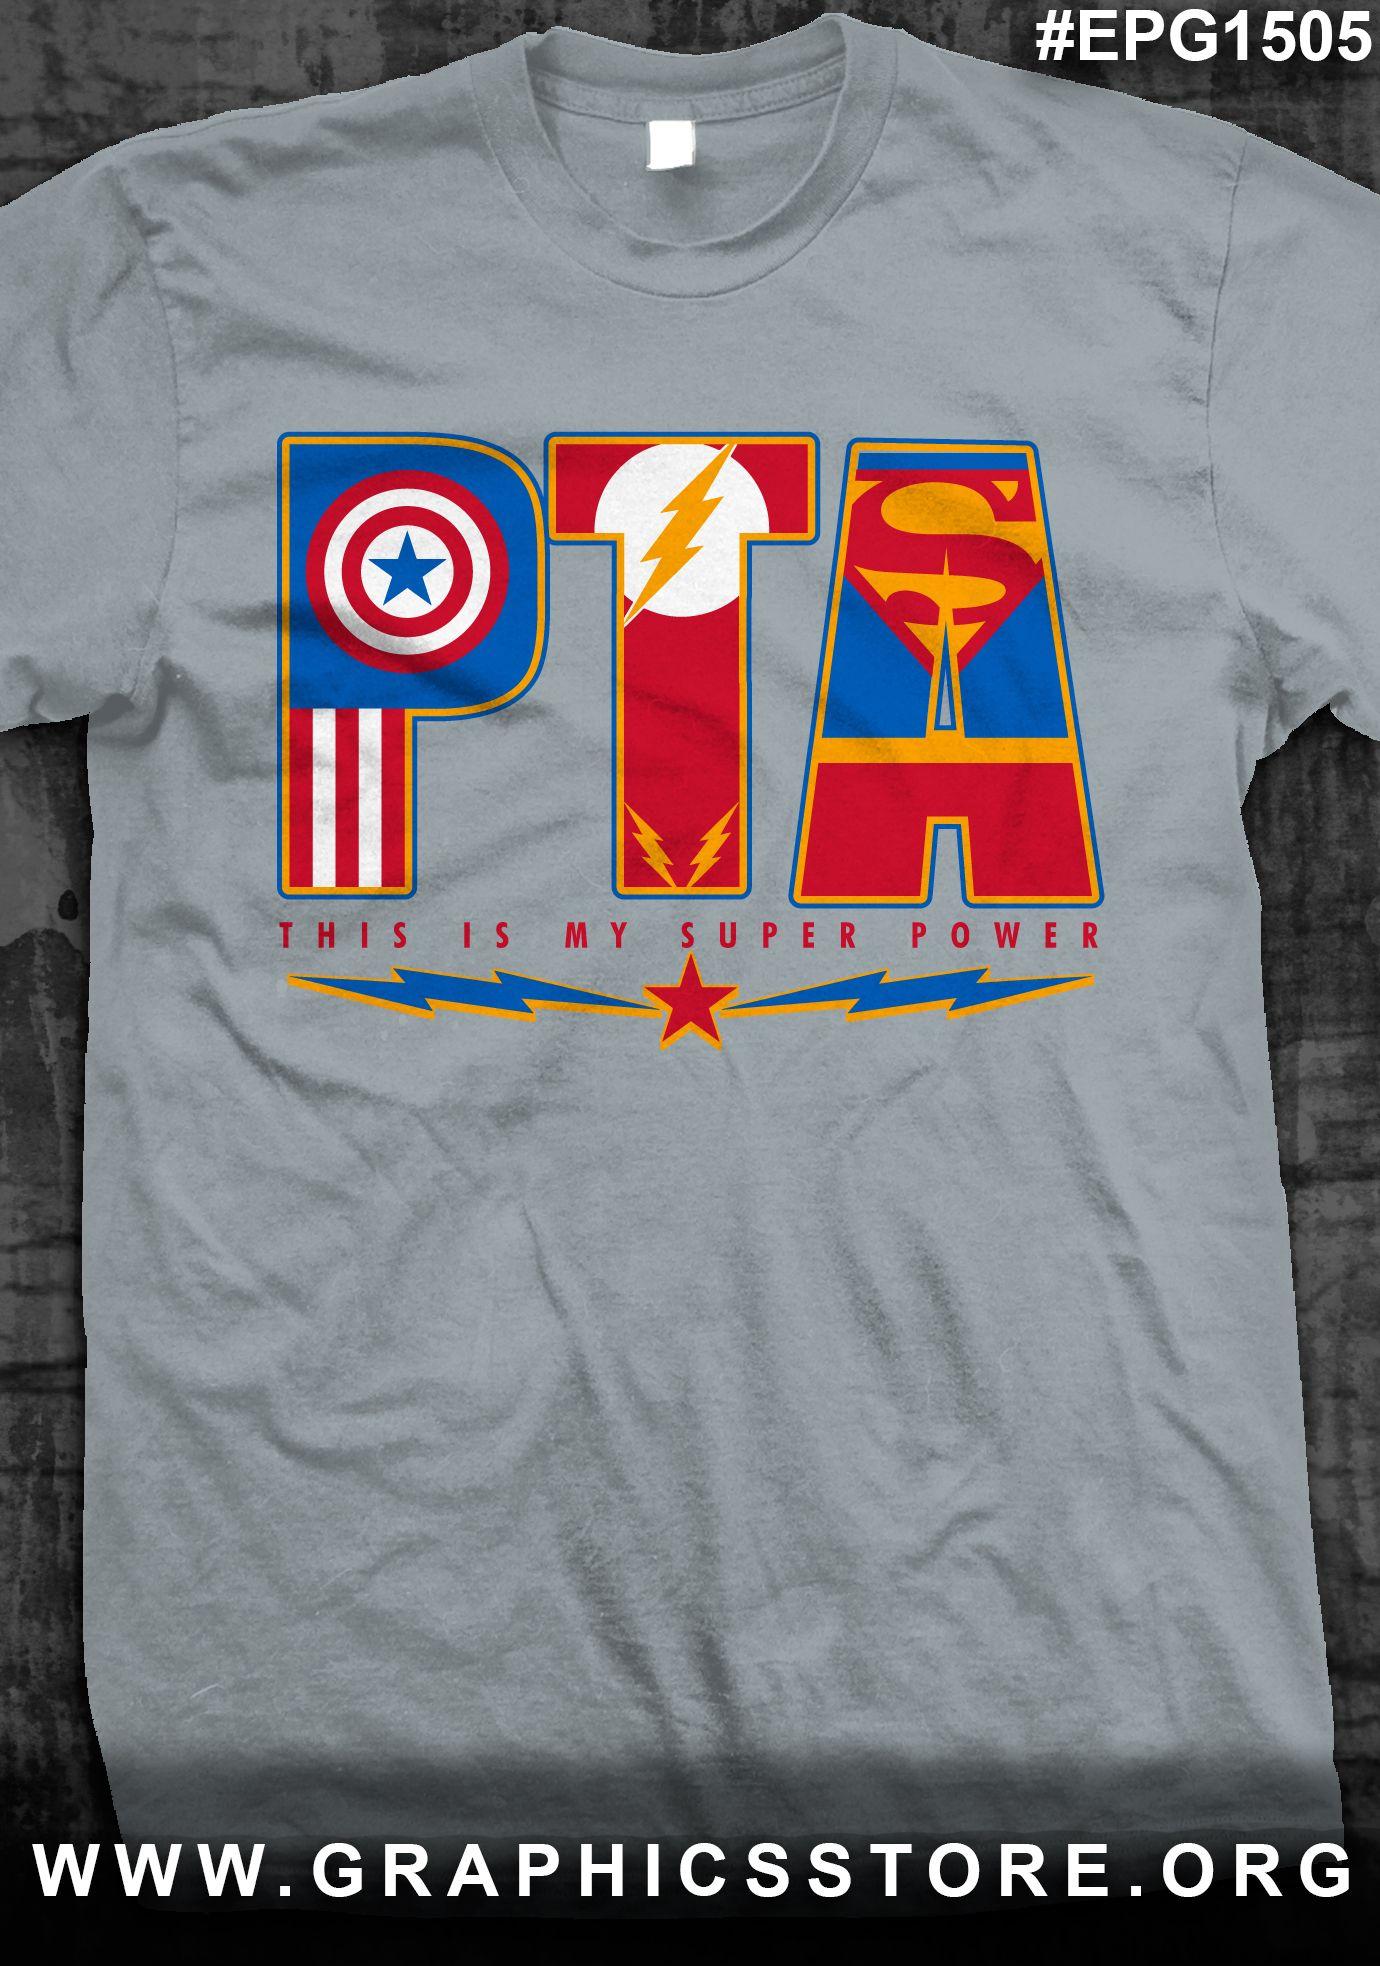 T shirt design ideas for schools - Epg1505 Pta School Shirt